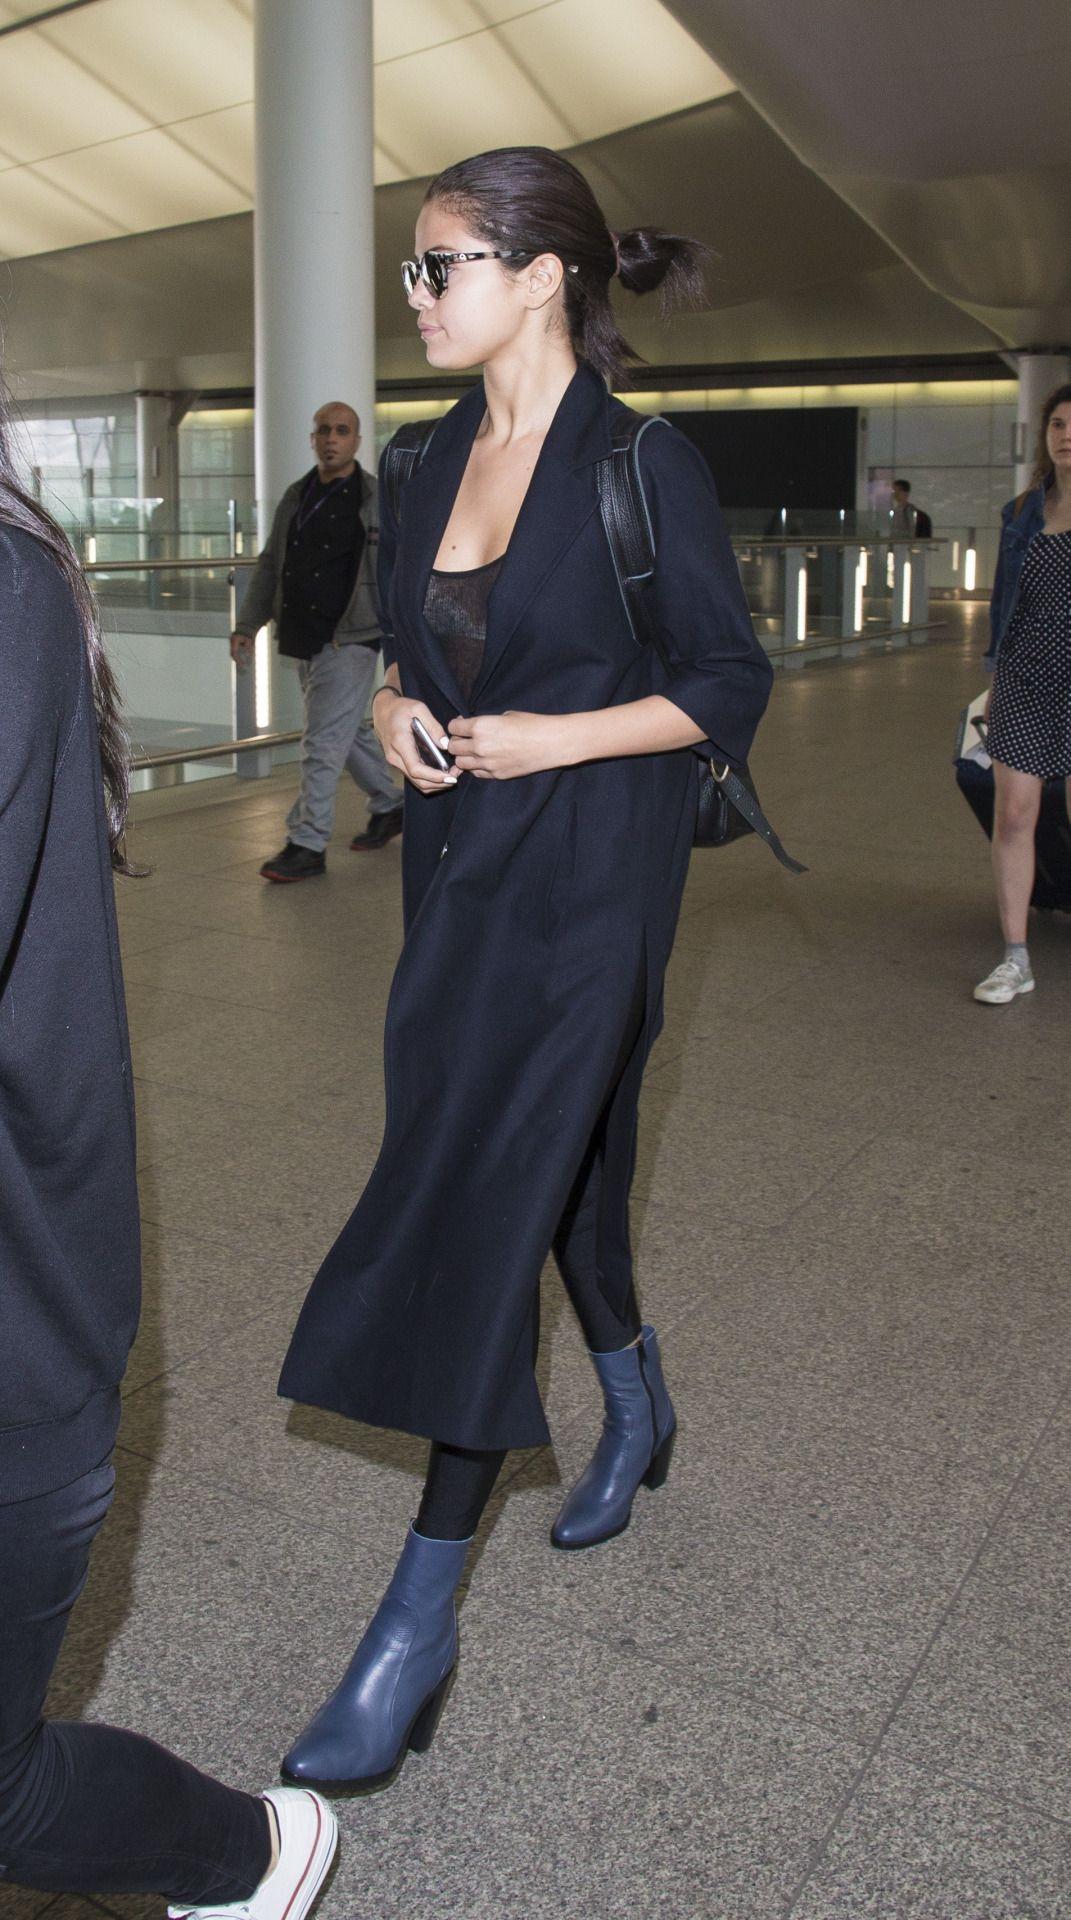 Topshop Shoes Selena Gomez Socks Airport Wwwmiifotoscom